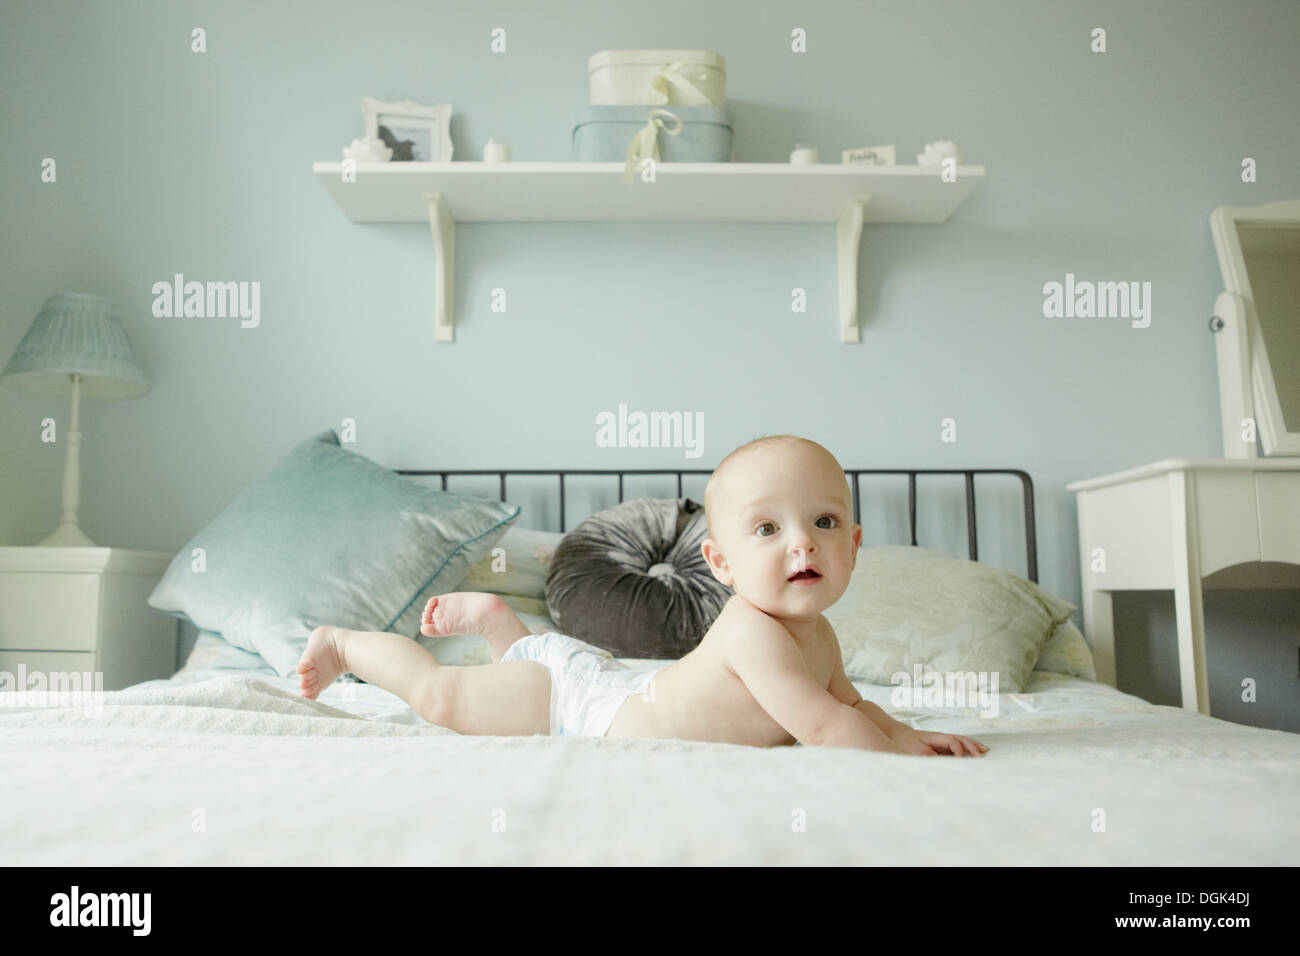 Baby Boy lying on/on bed Photo Stock